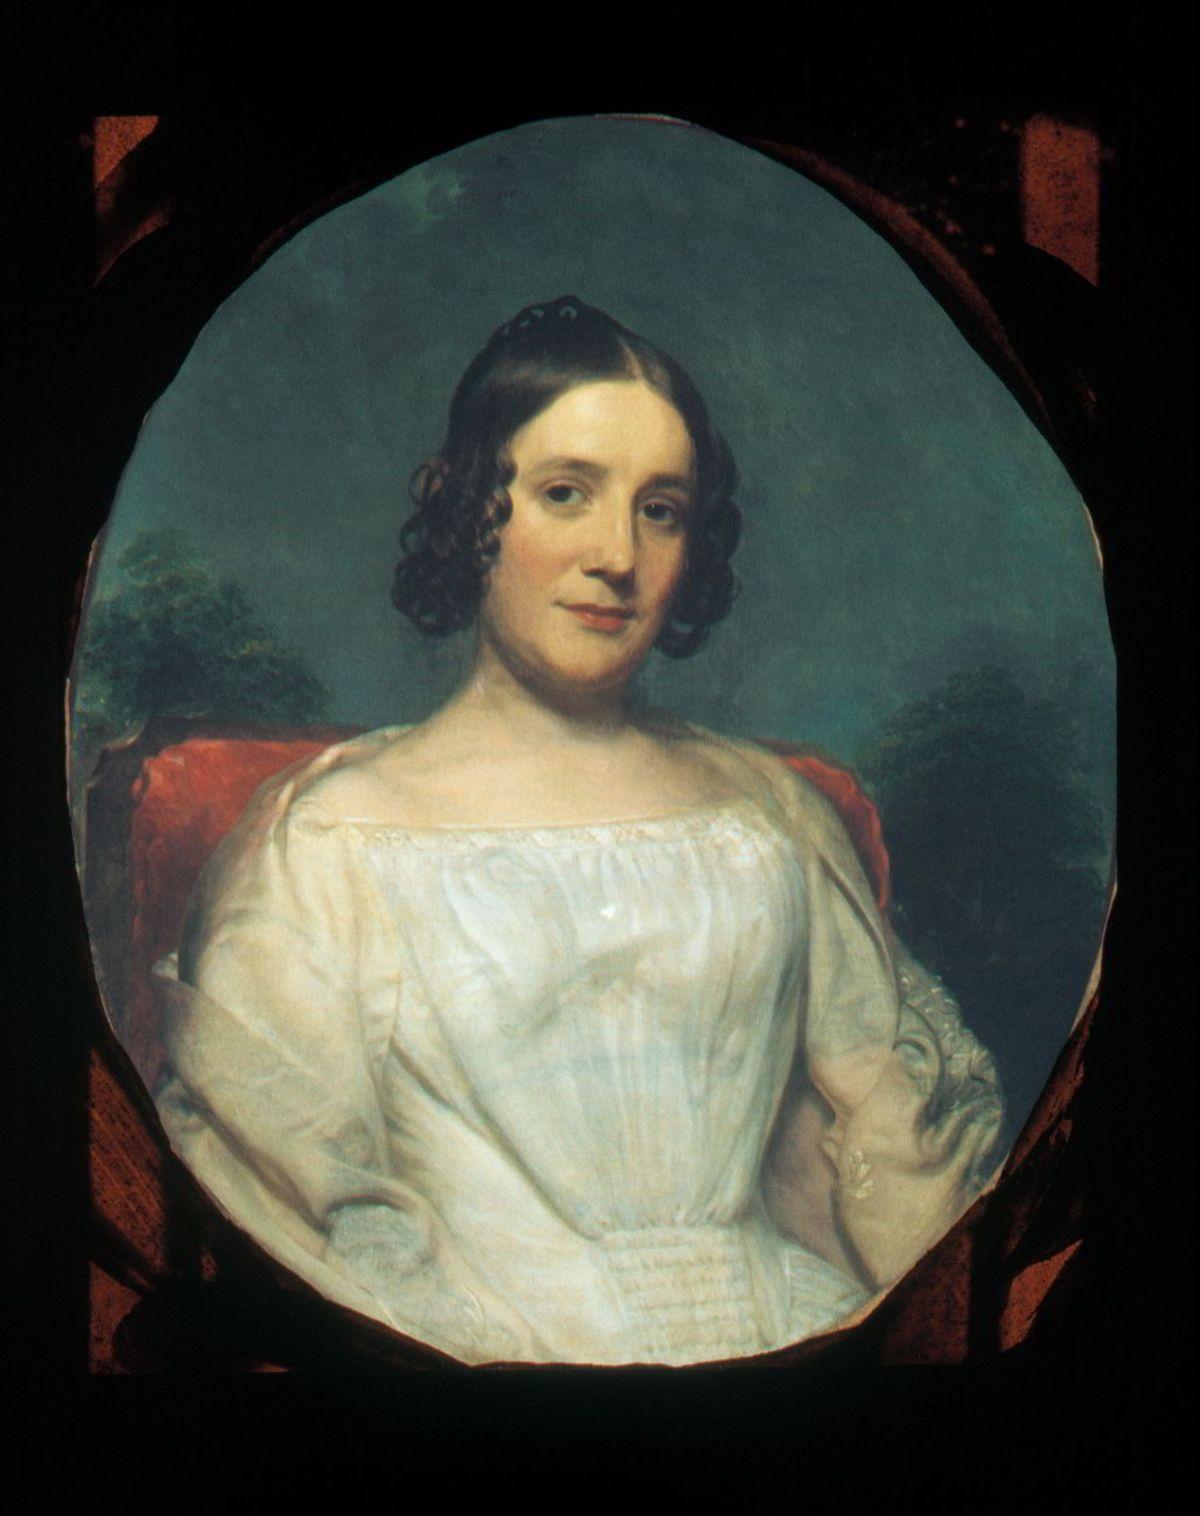 Mrs. Adrian Baucker Holmes by Charles Wesley Jarvis